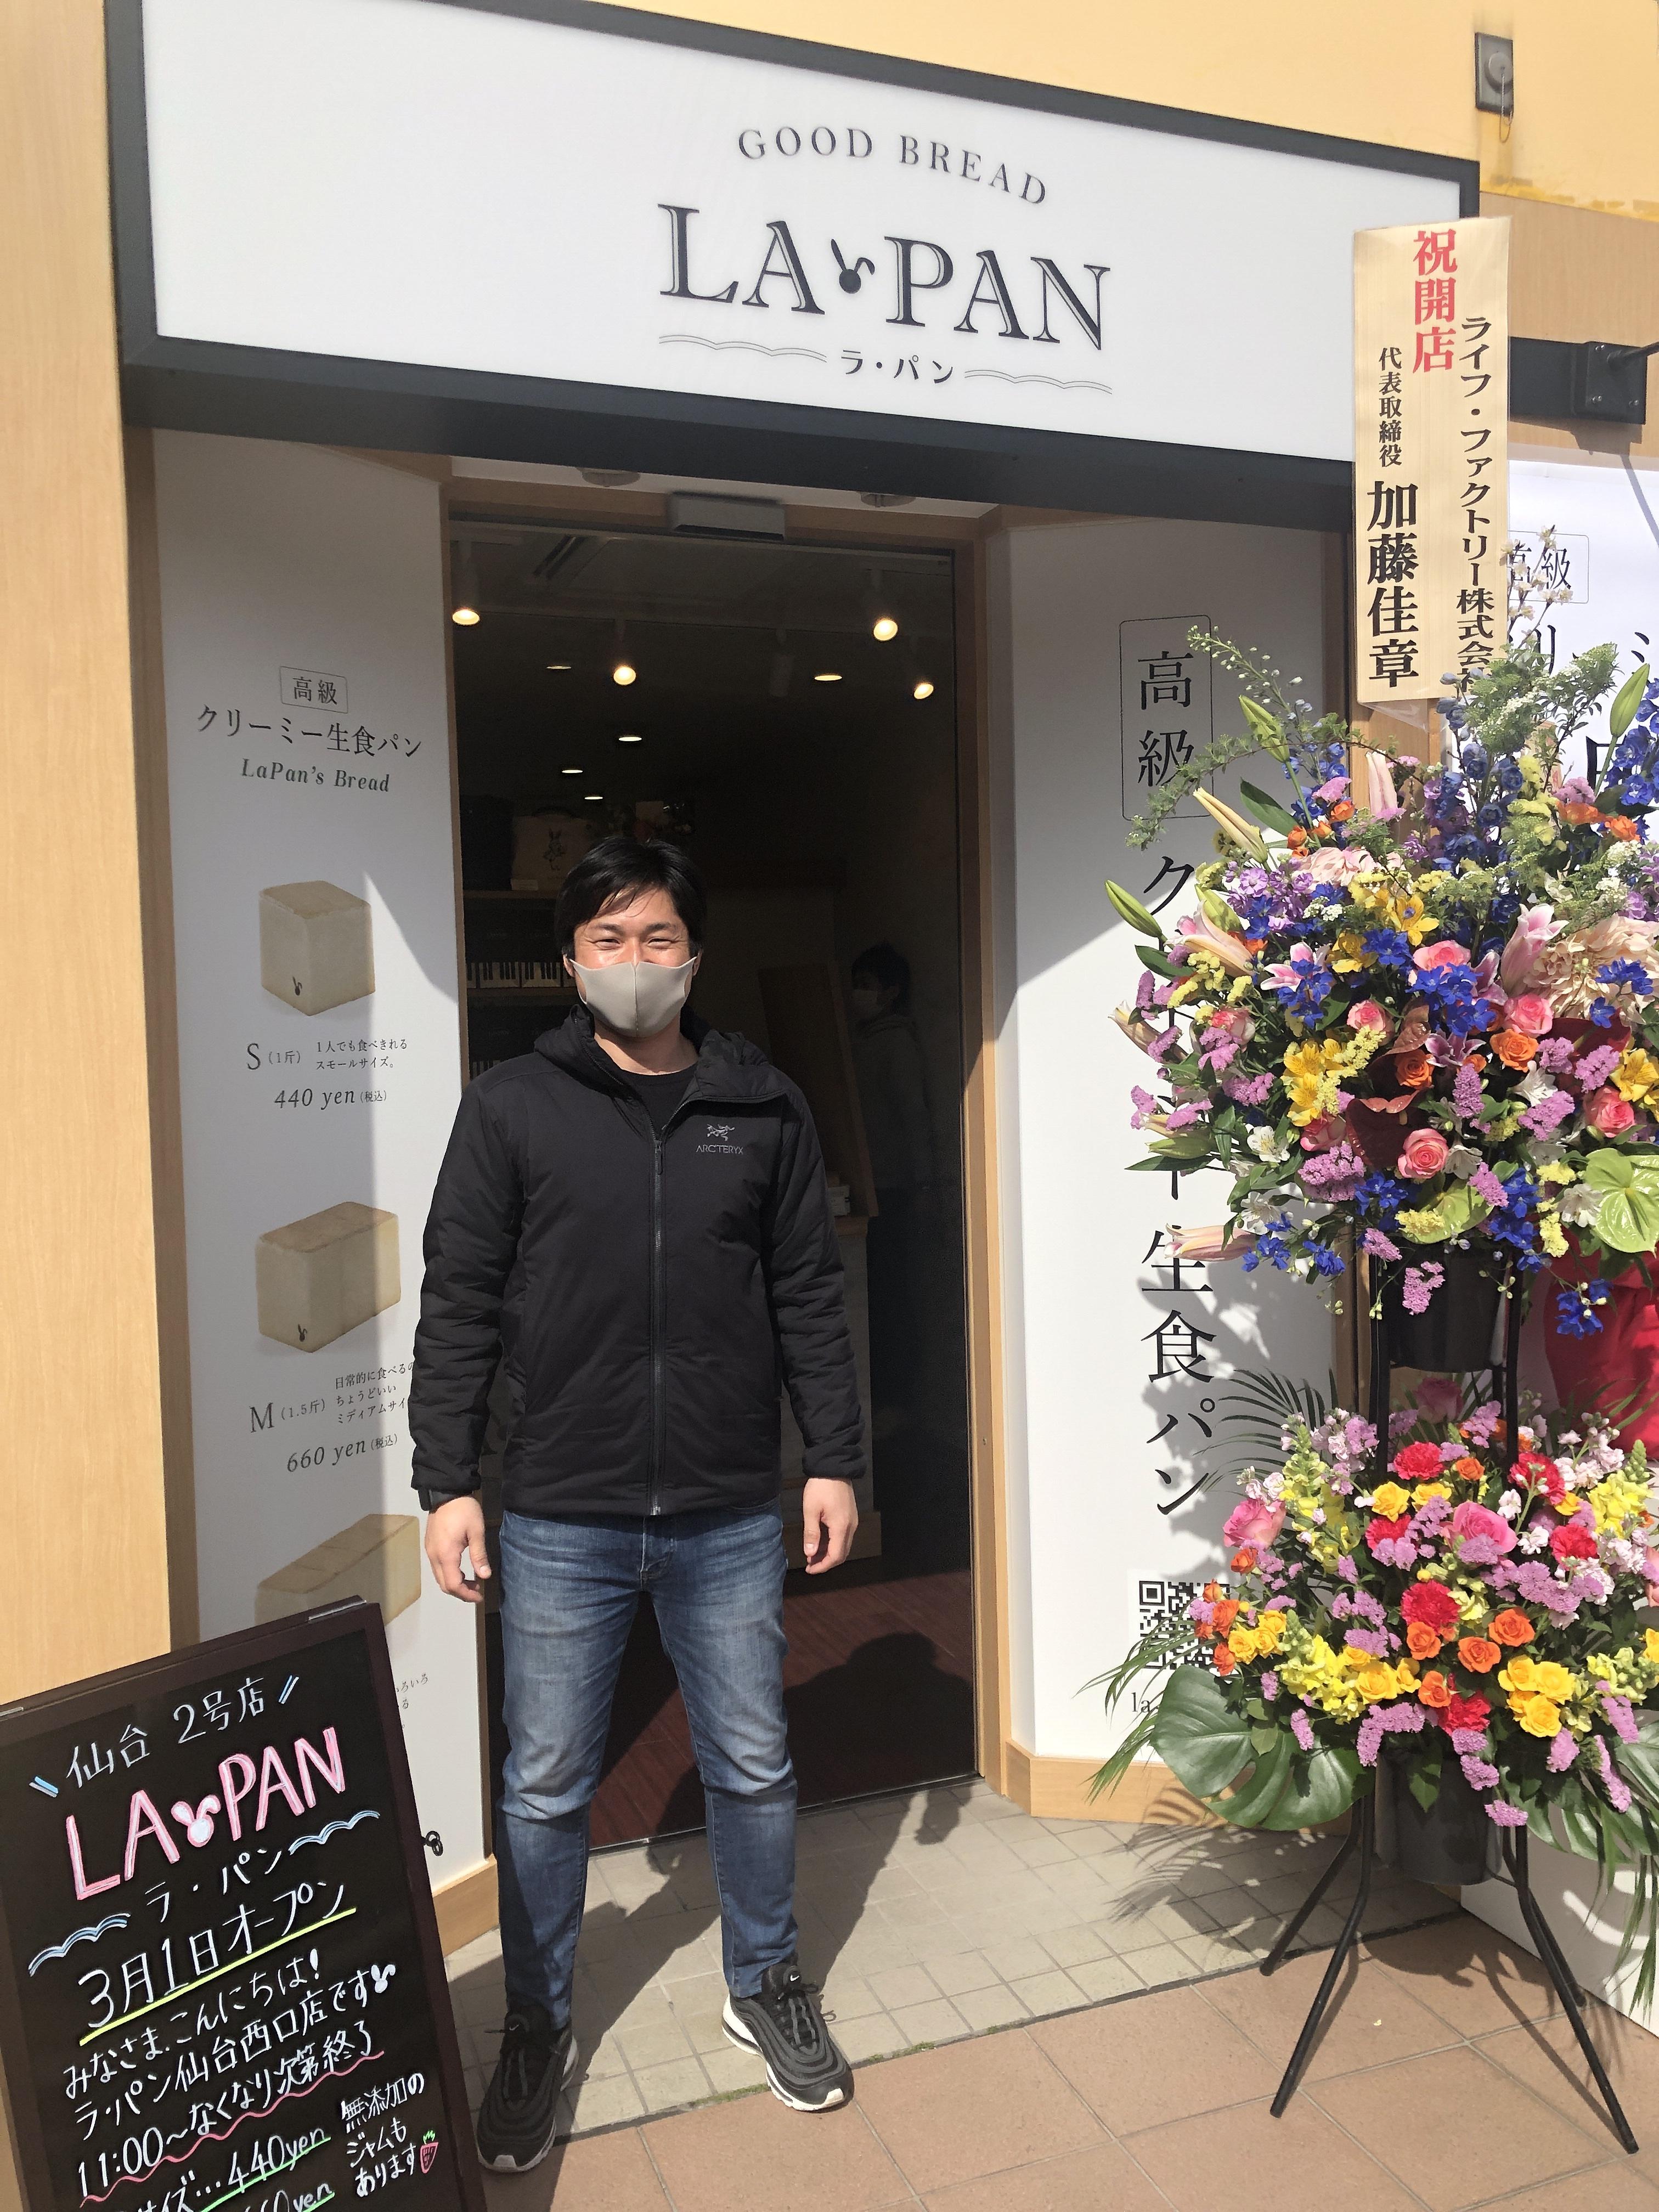 ラパン仙台2号店楽天長谷部